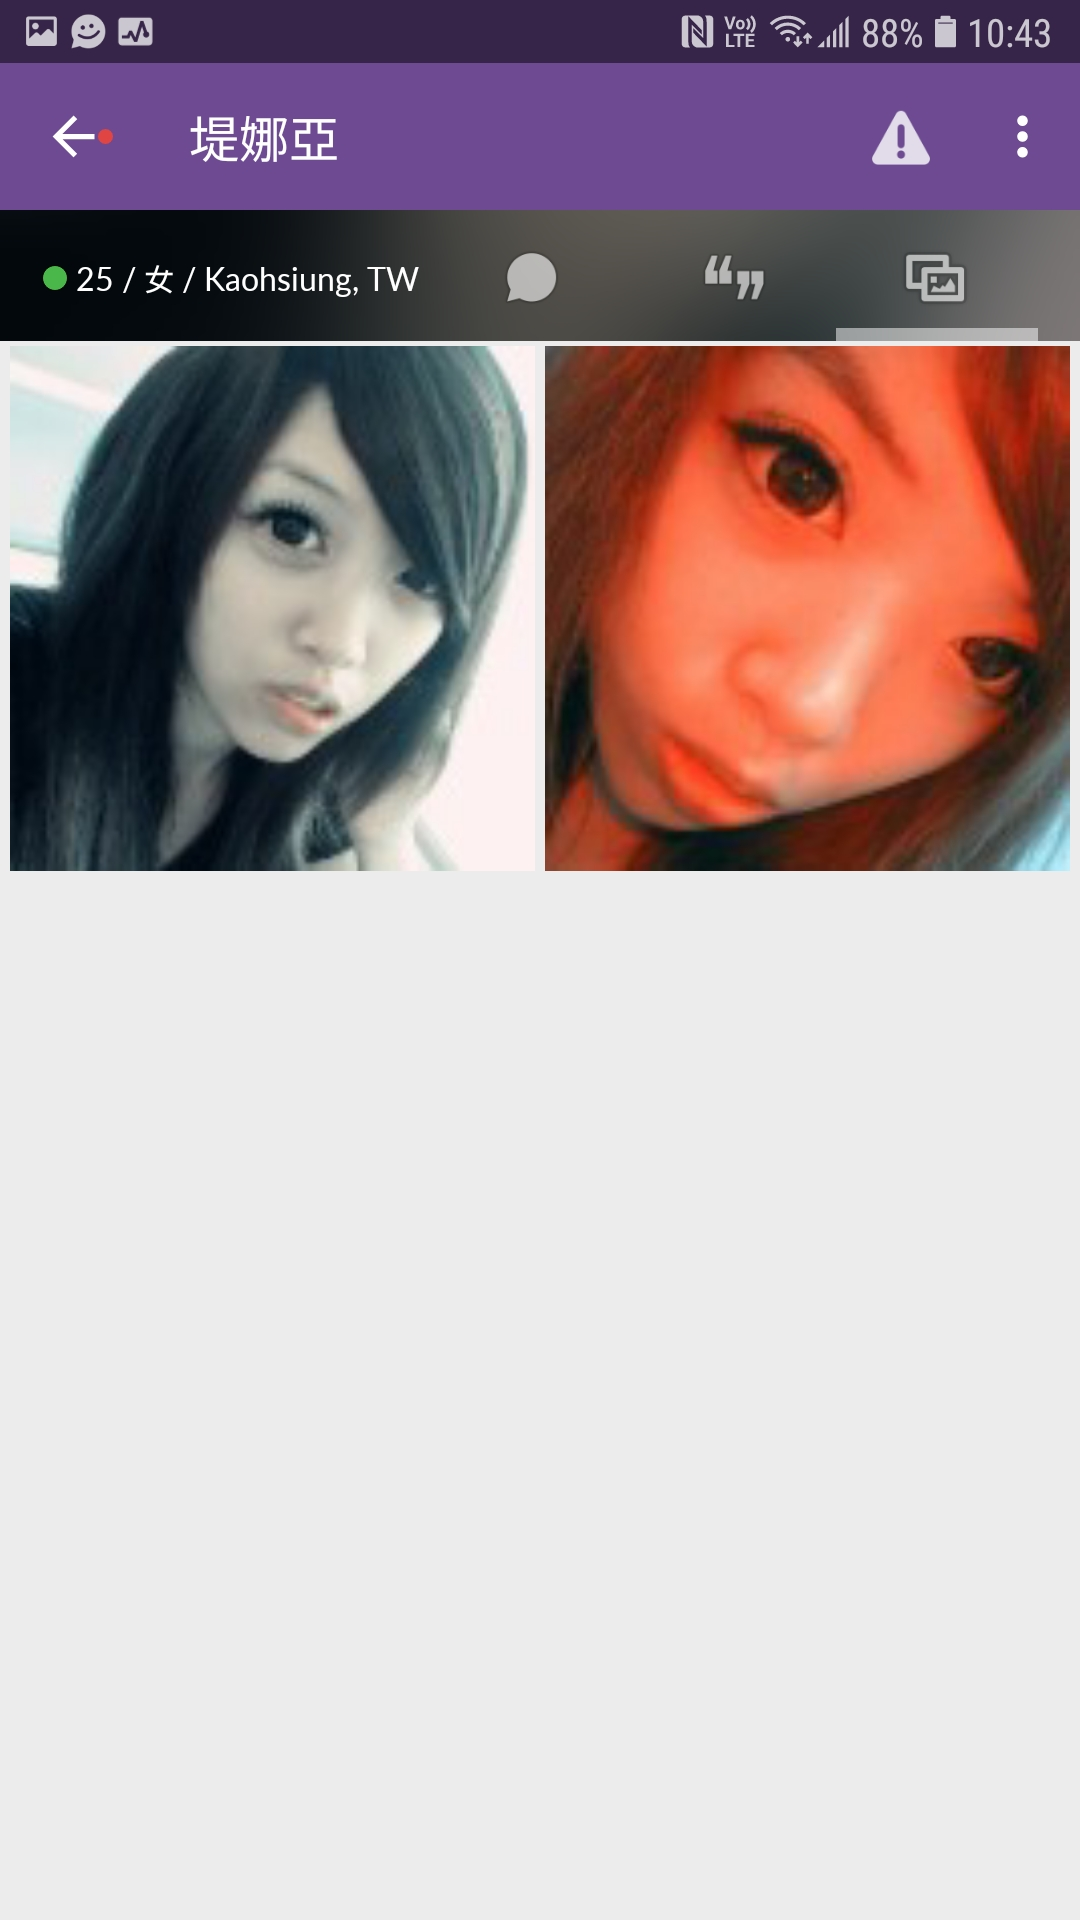 https://i.ibb.co/VJct392/Screenshot-20200209-104341-Meet-Me.jpg